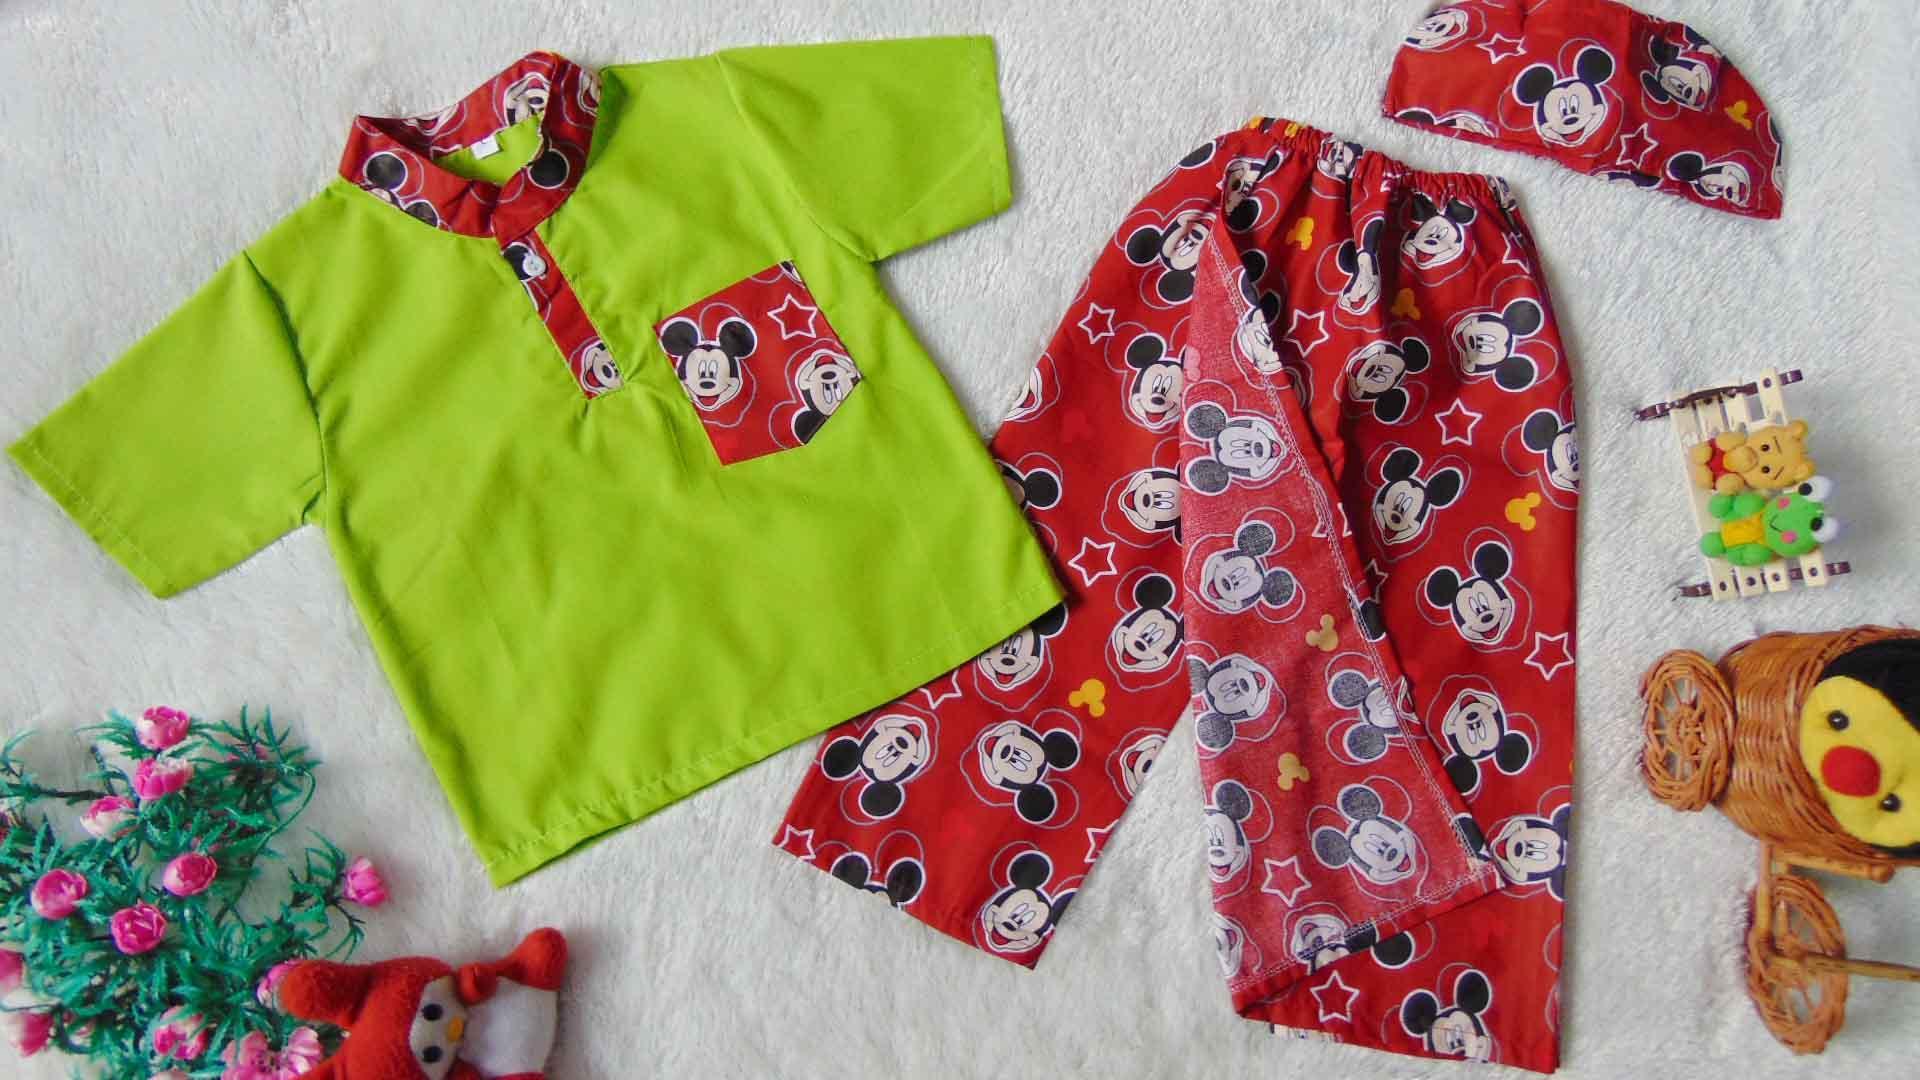 Gambar Produk Rinci kembarshop - baju koko setelan baju muslim sarkoci sarung koko peci anak uk L 2-3th motif random Terkini